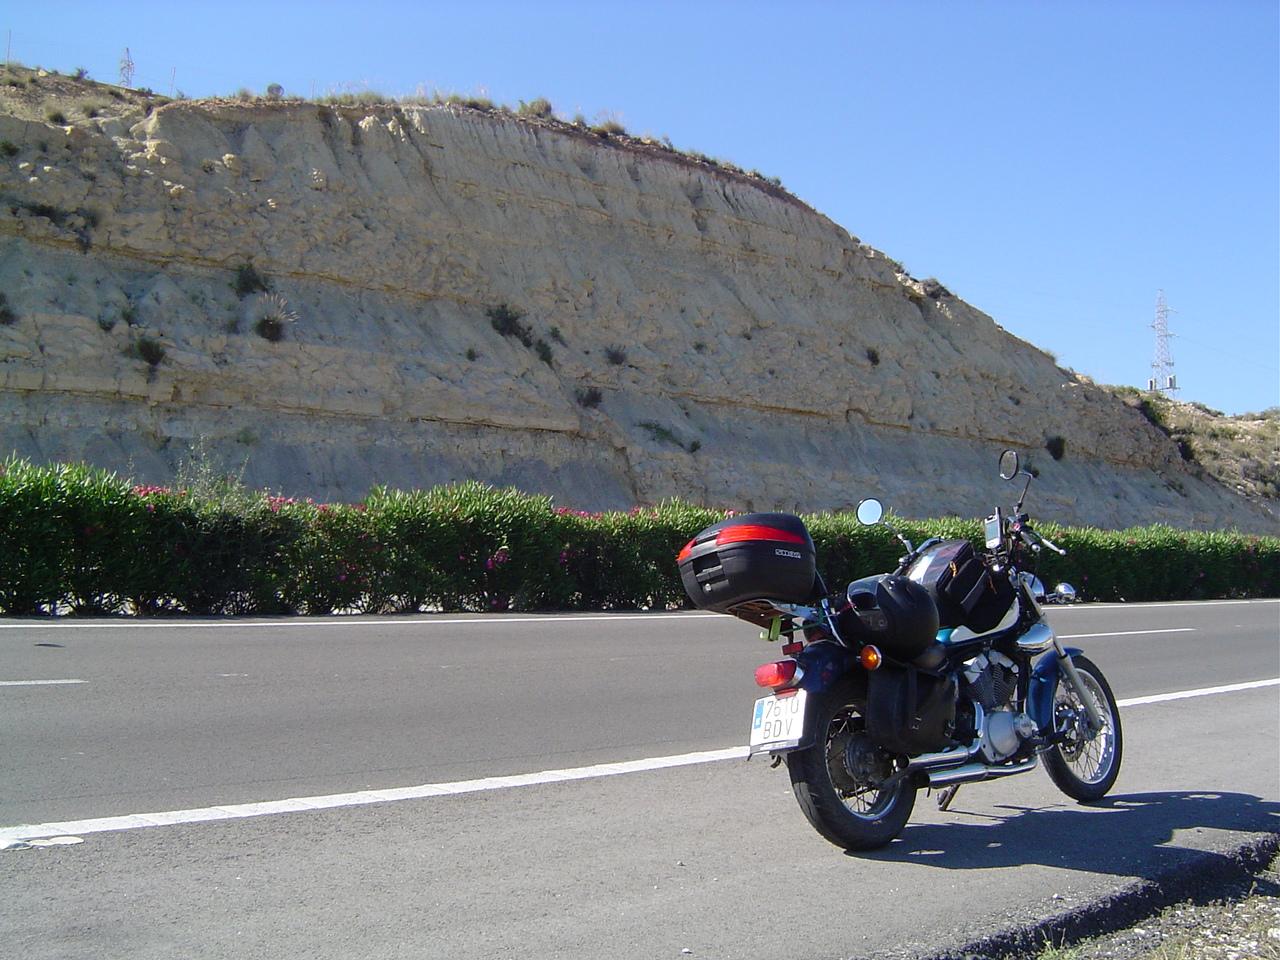 Foto playa Cala Lanuza. Falla cerca de Benidorm, en la Autopista del Mediterráneo